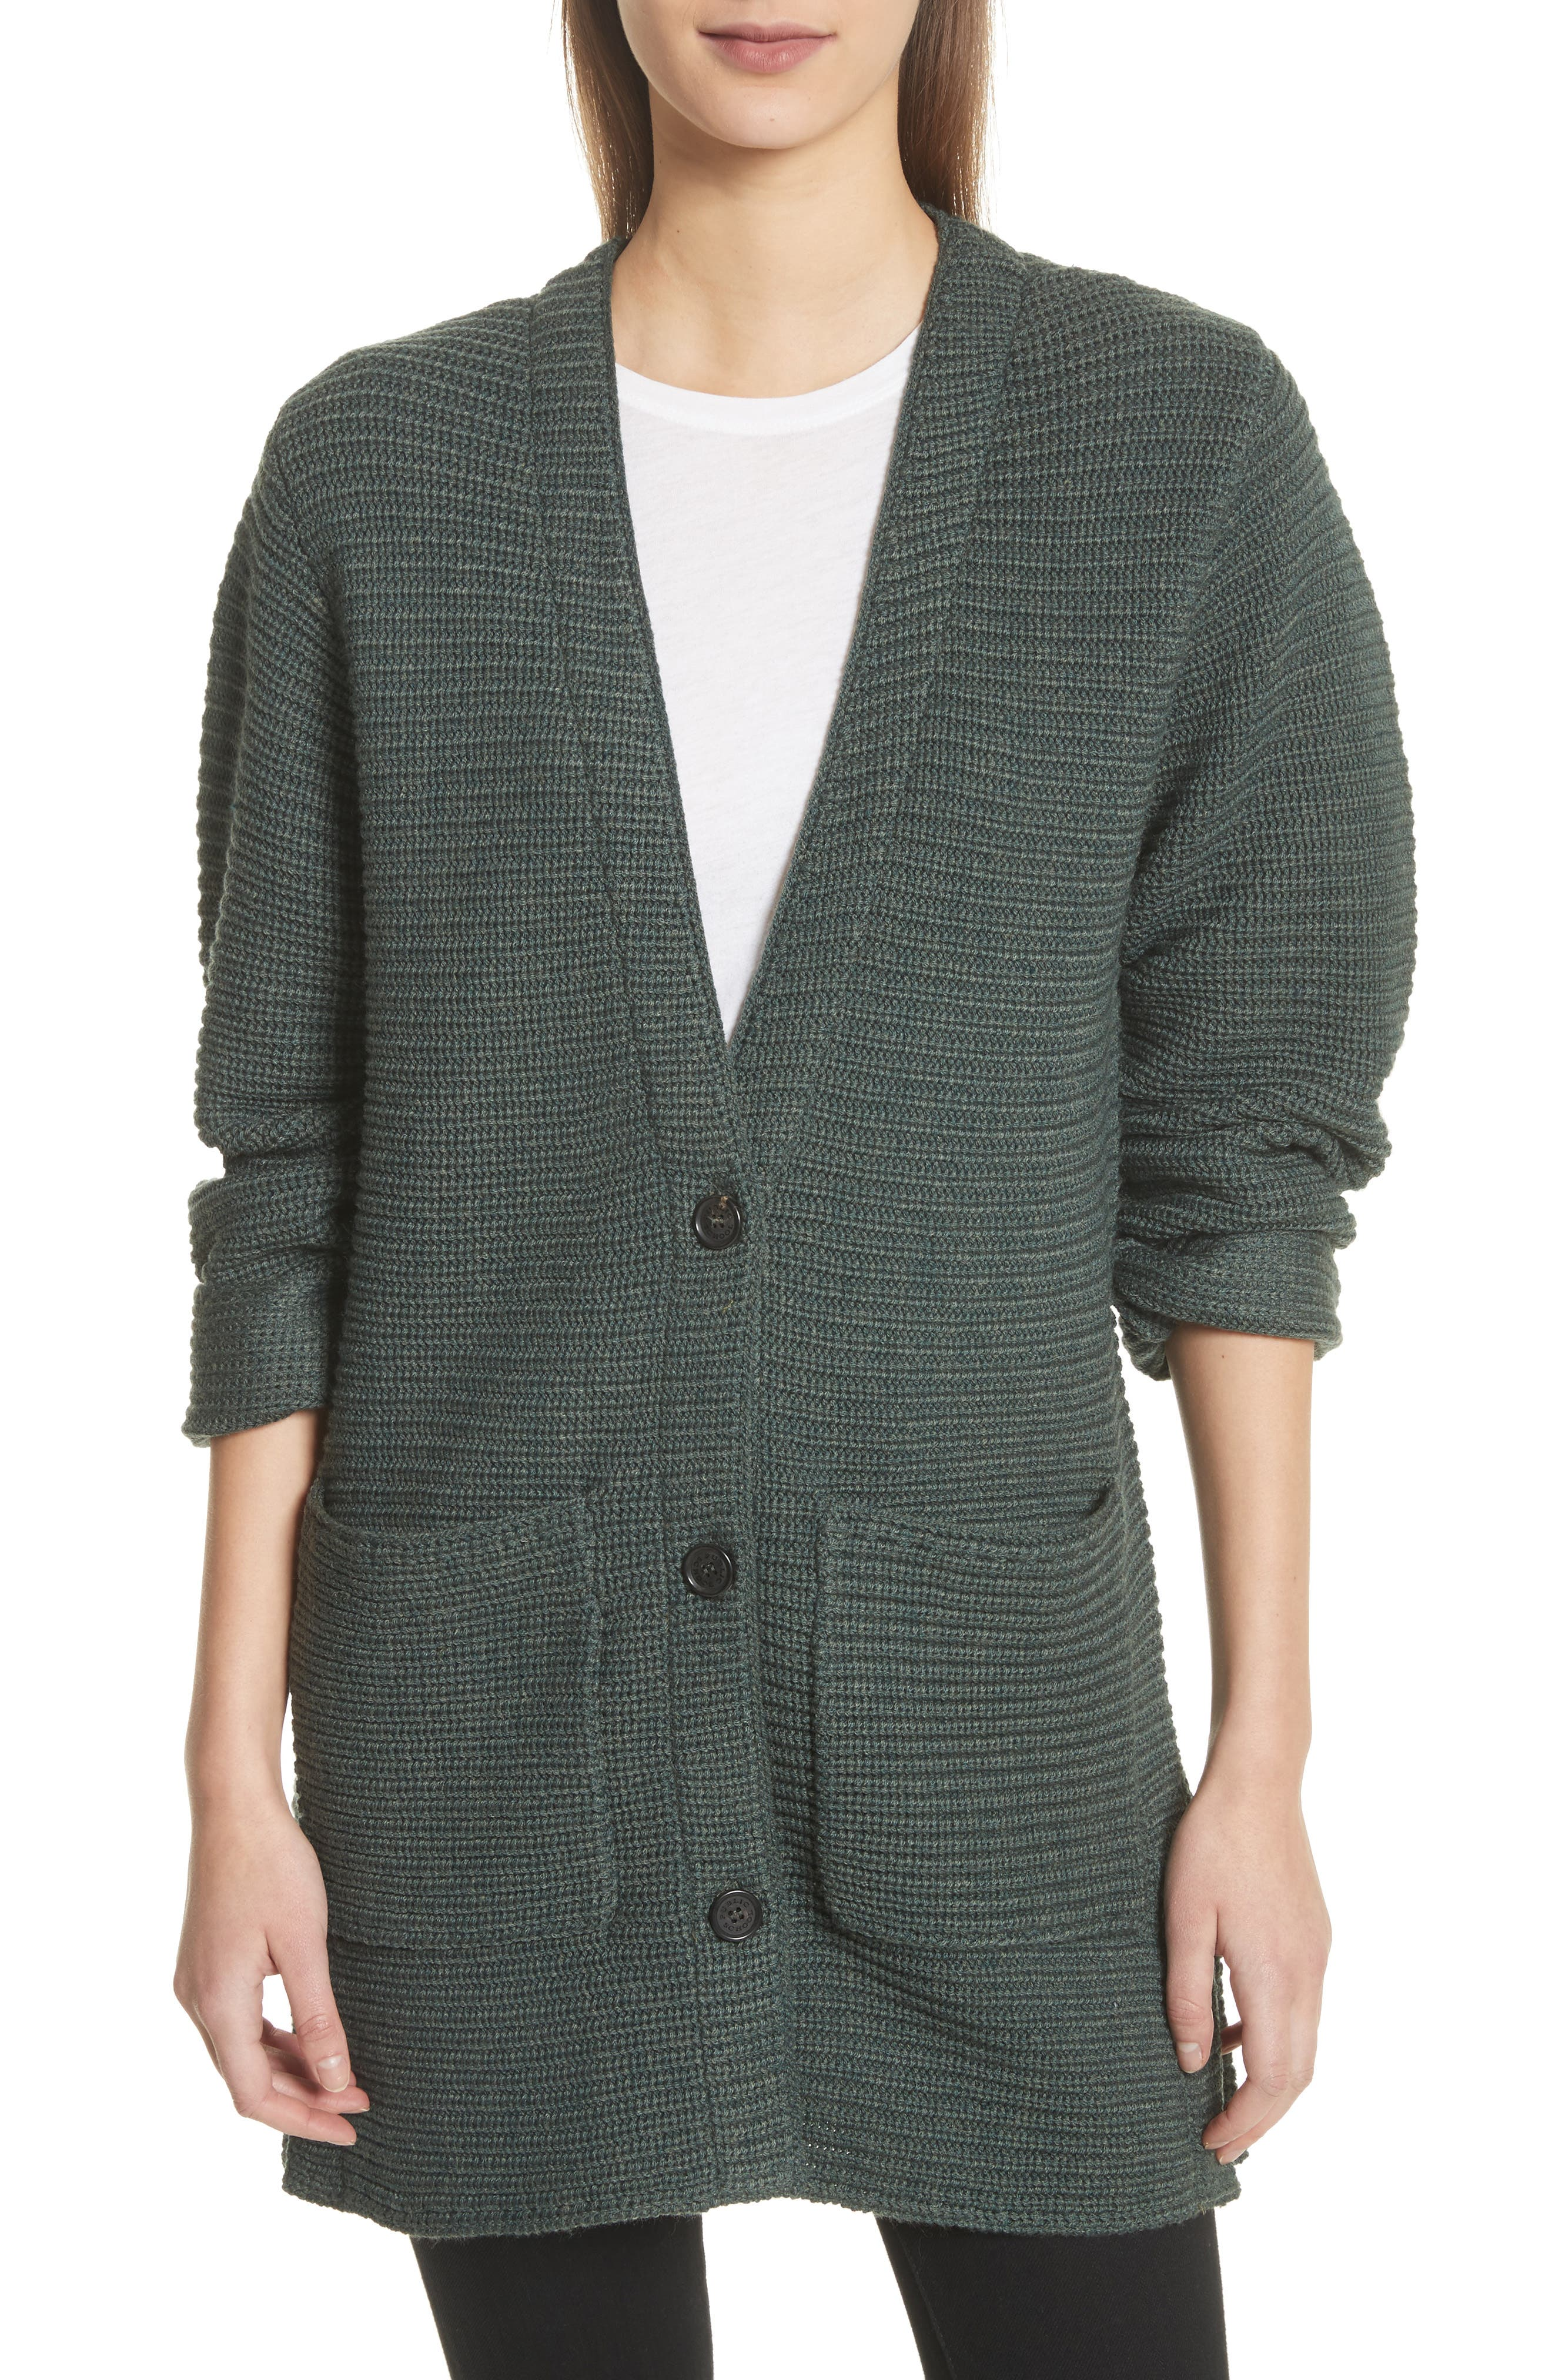 Fleta Merino Wool Blend Cardigan,                             Main thumbnail 1, color,                             Olive